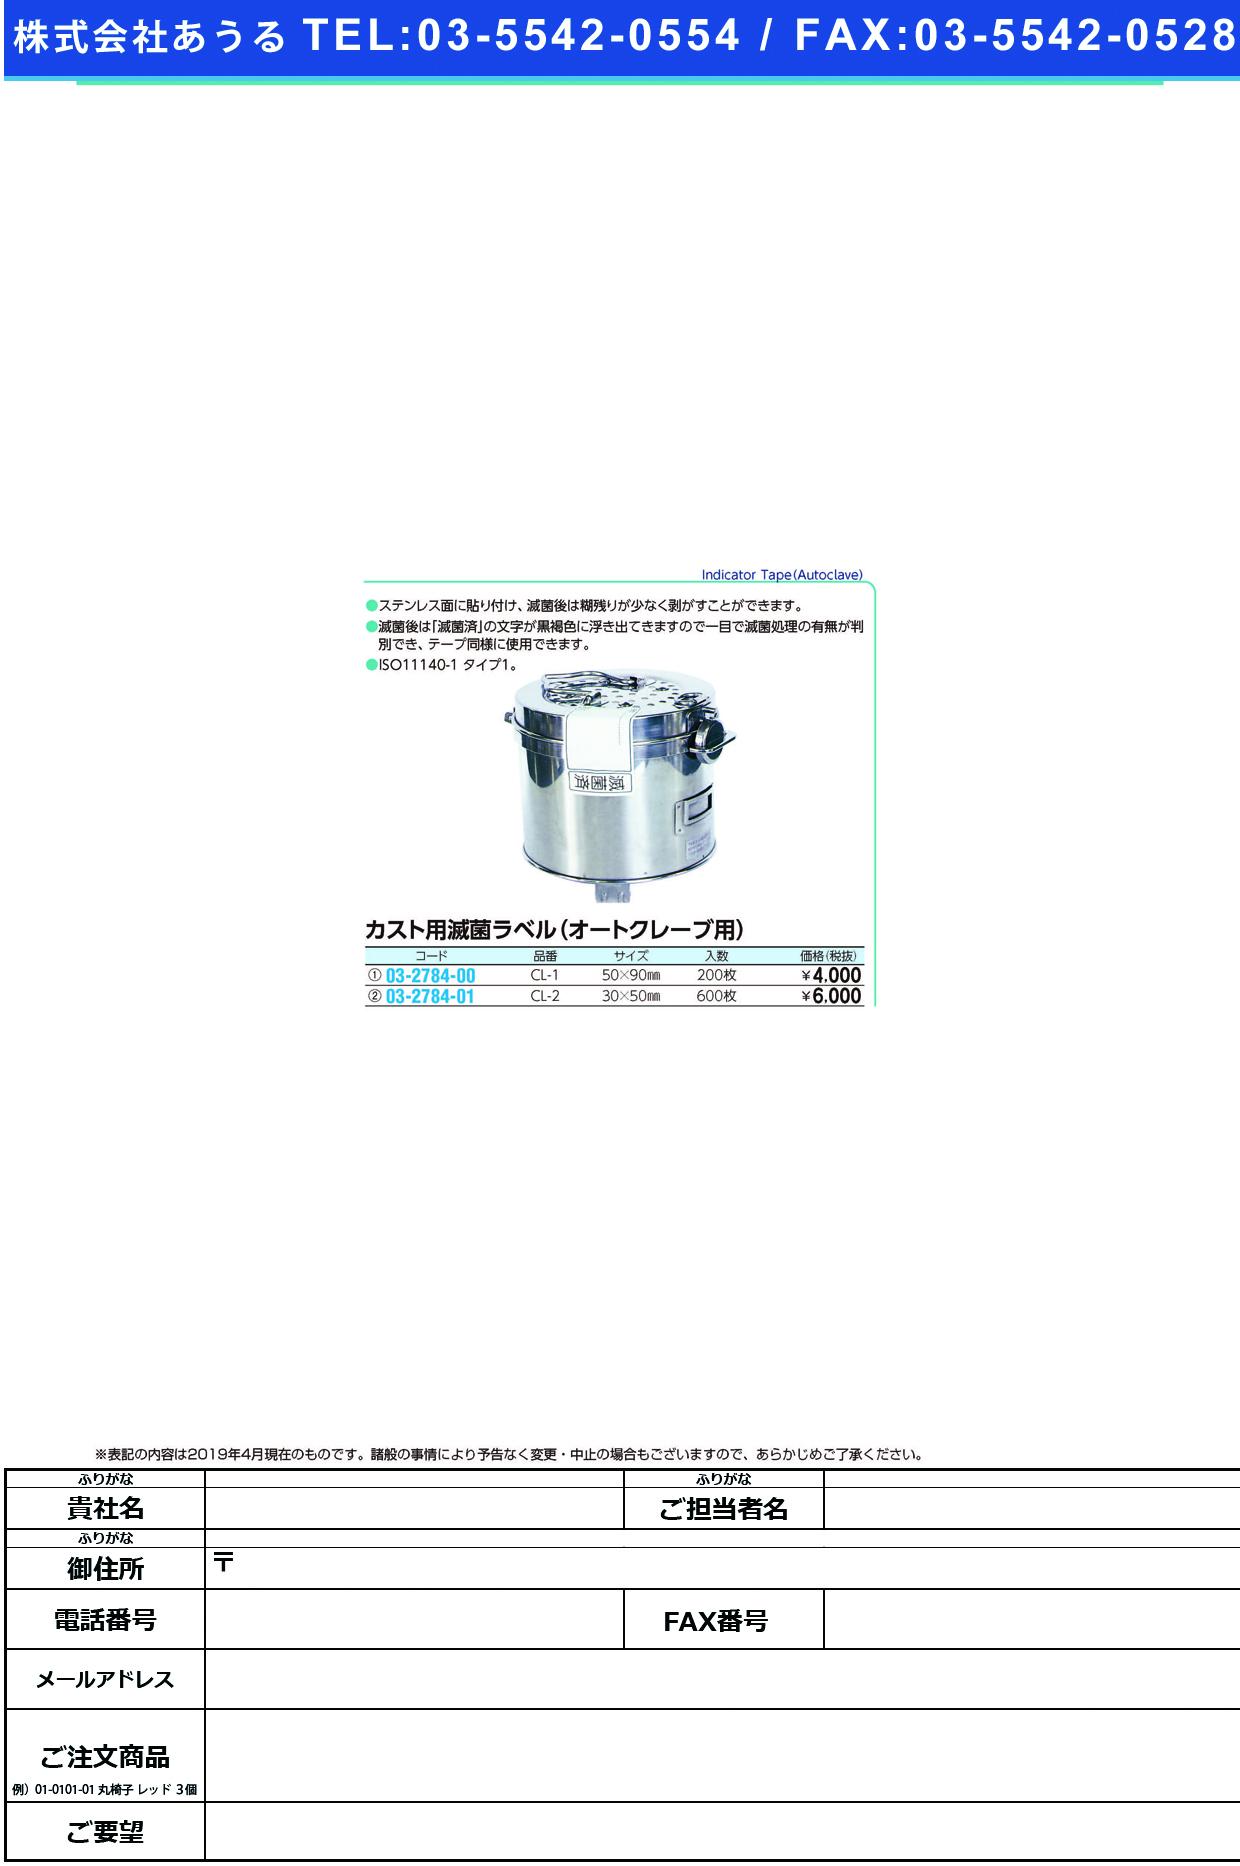 (03-2784-01)HPカスト用滅菌ラベル(蒸気滅菌用) CL-2(30X50MM)600マイイリ HPメッキンラベル(イワツキ)【1箱単位】【2019年カタログ商品】